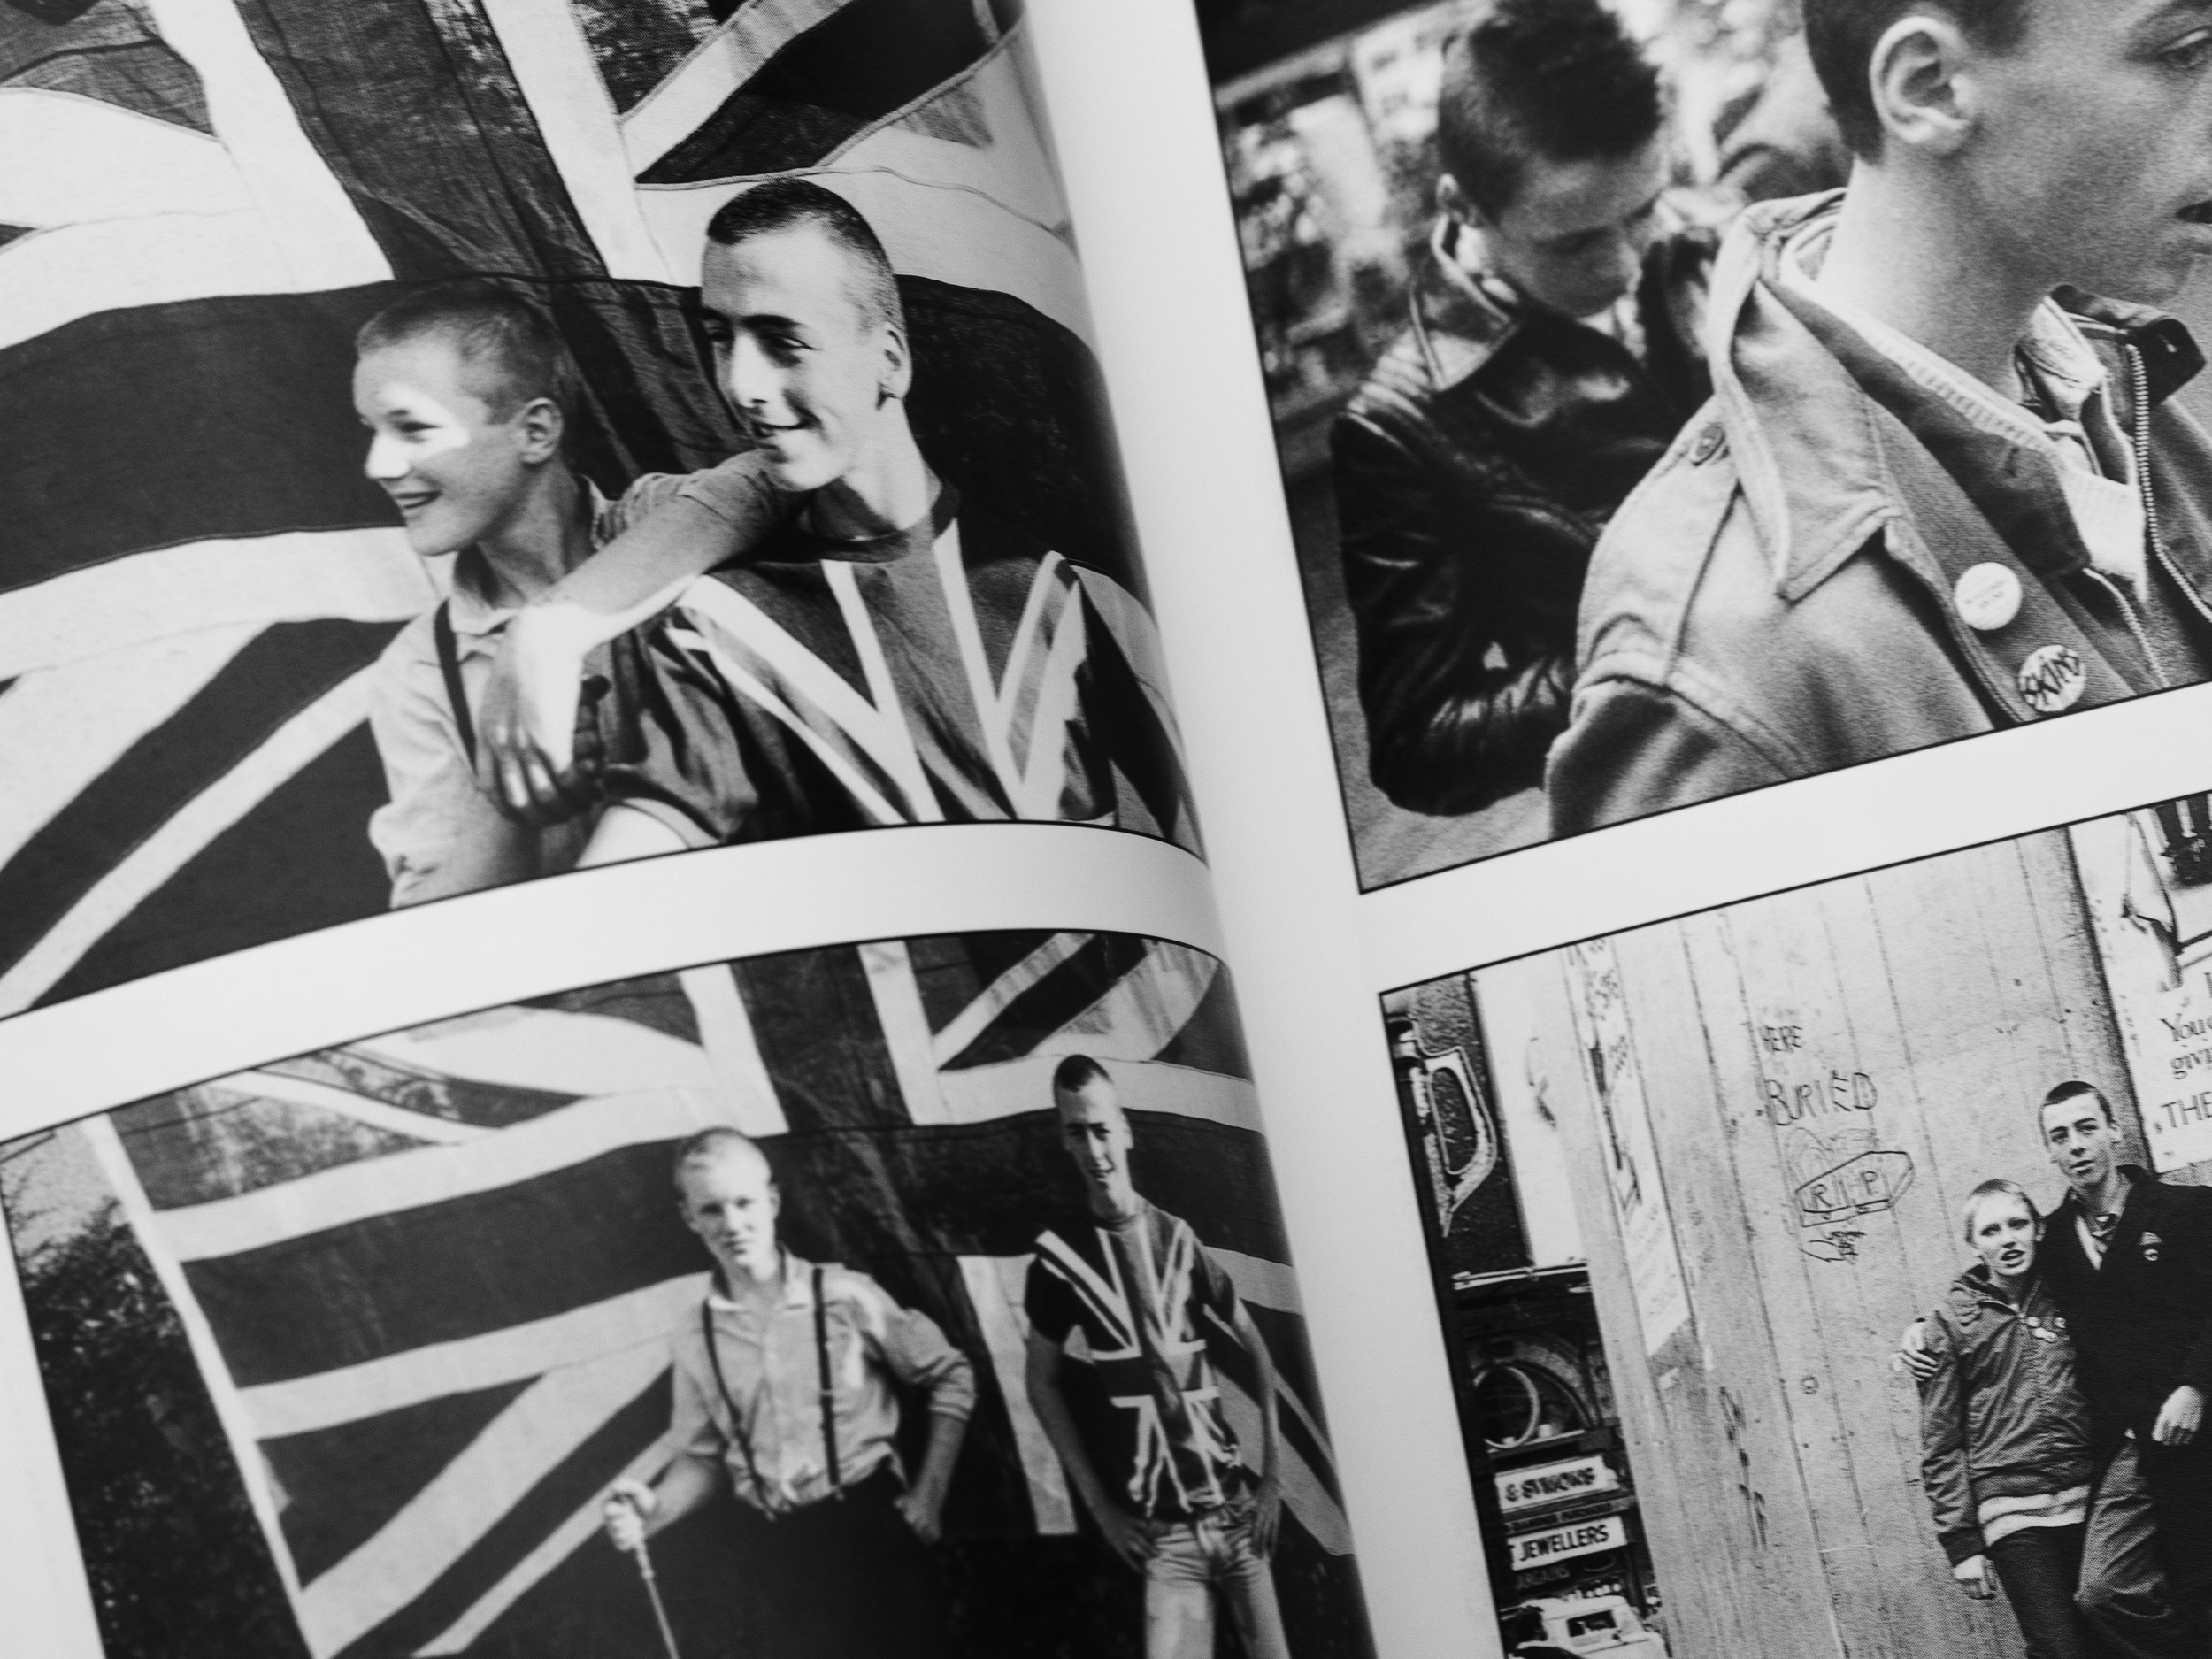 GAVIN WATSON ARCHIVE SKINS BOOK3.jpg